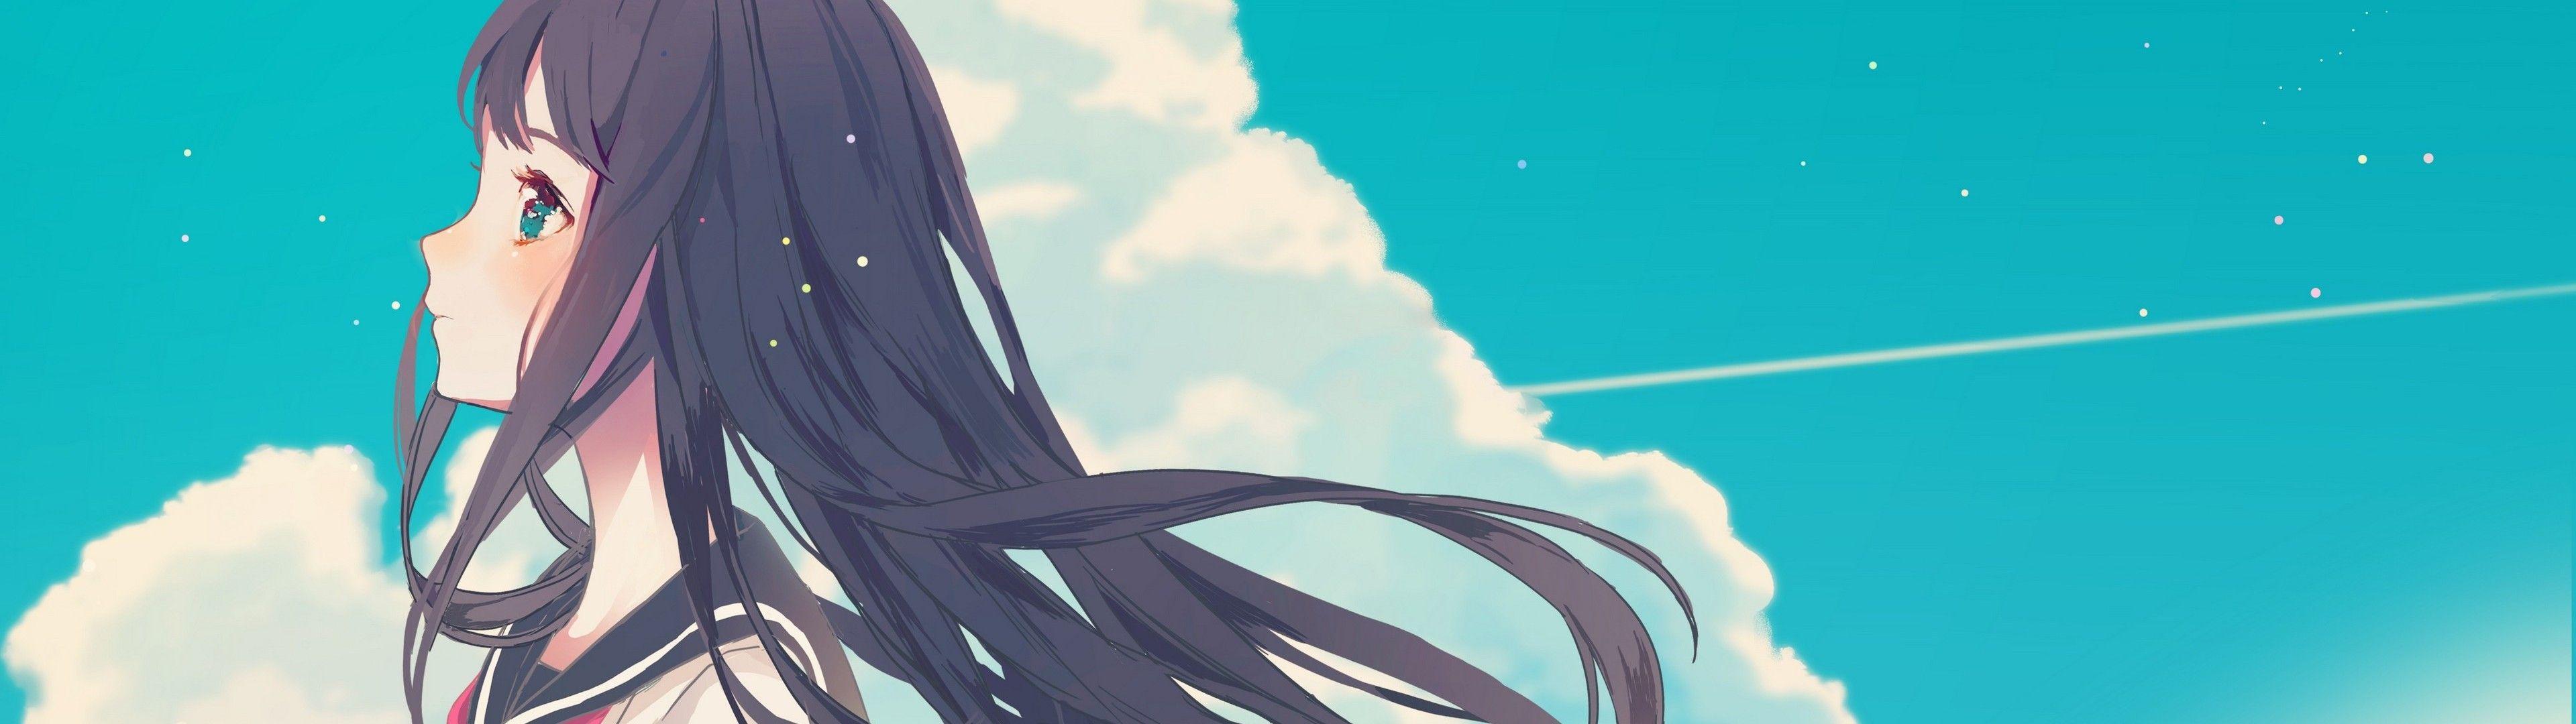 Anime 3840x1080 Anime Girls Sky Clouds Black Hair School Uniform Character Wallpaper Anime 3840x1080 Wallpaper